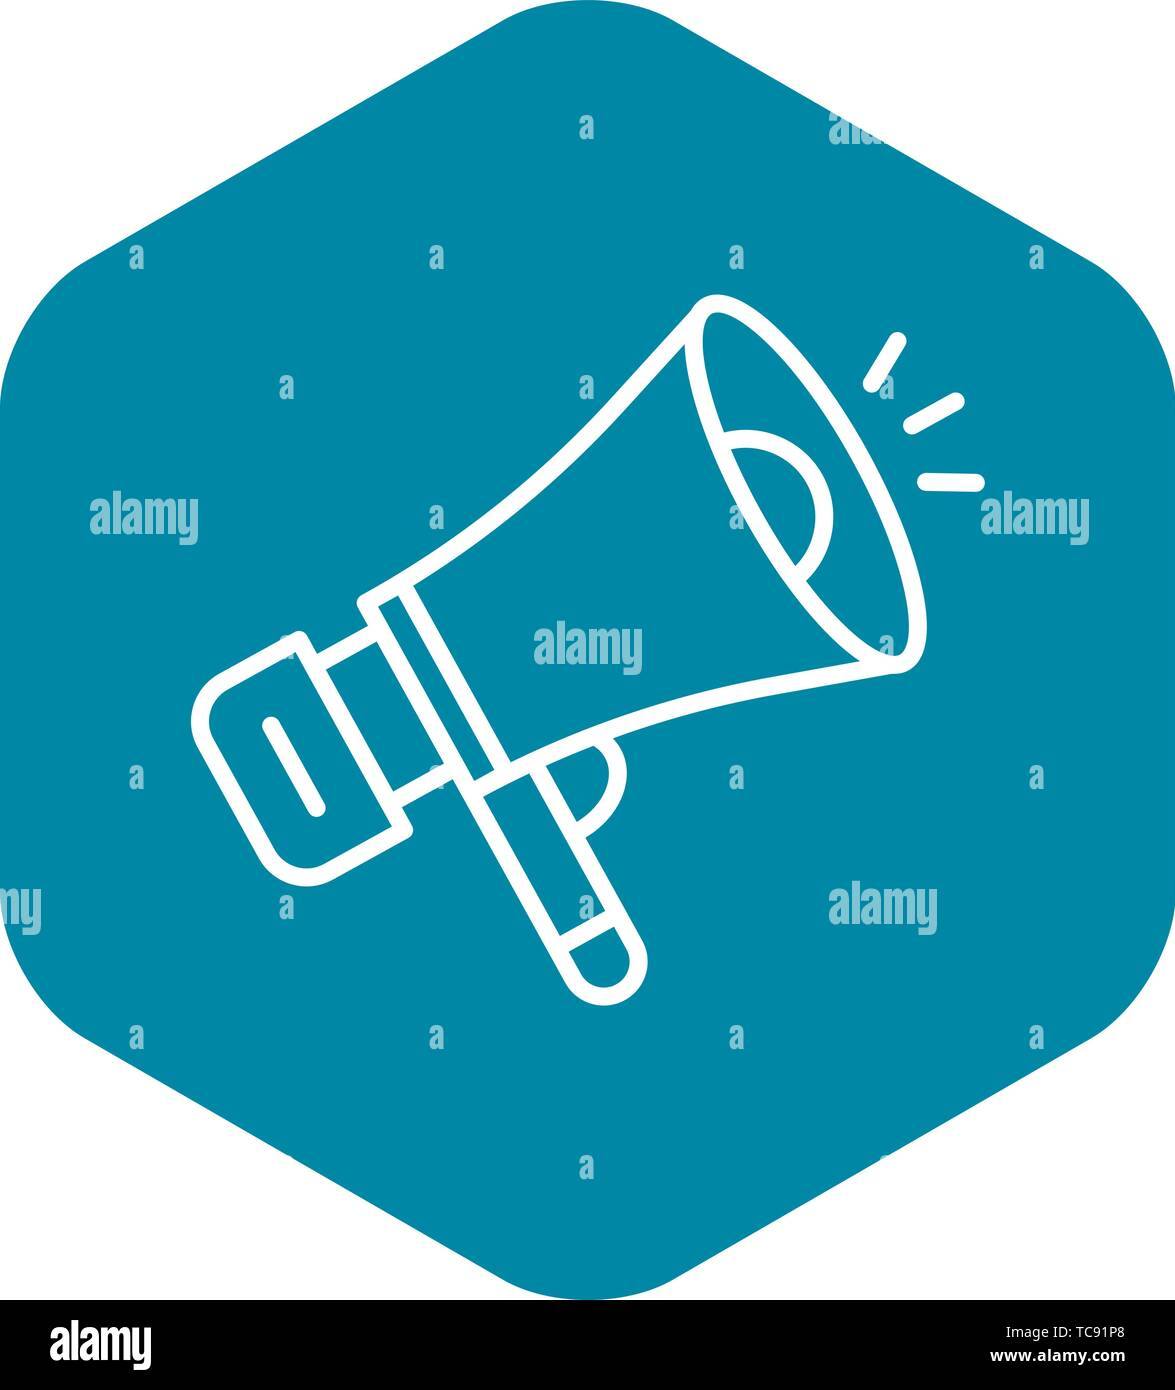 Media megaphone icon, outline style - Stock Image